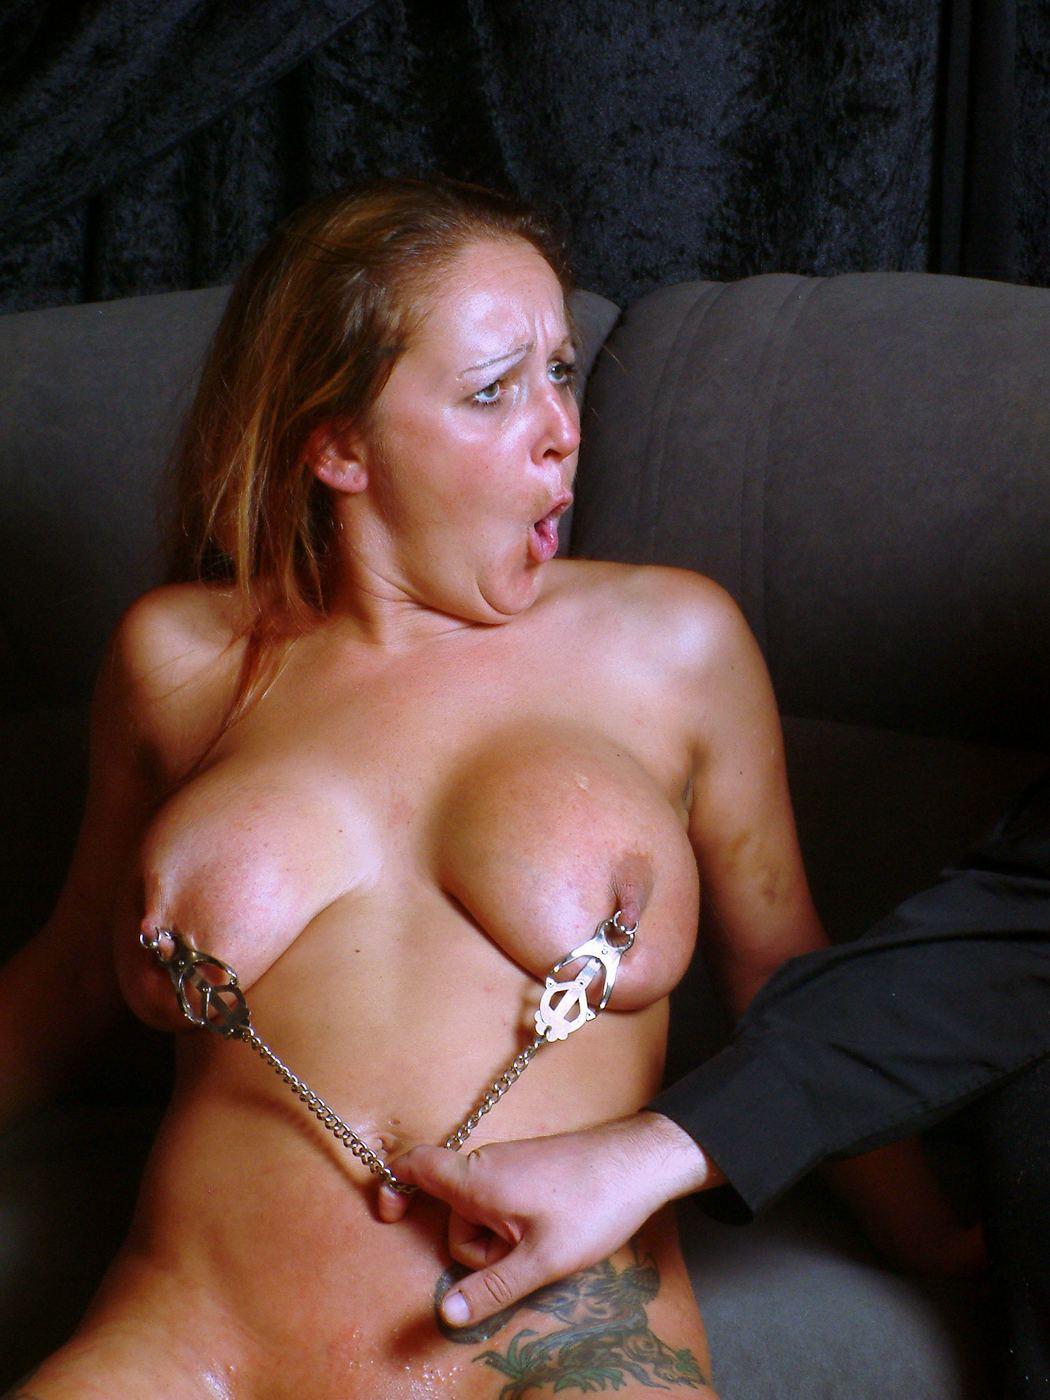 wife breast bondage jpg 1152x768